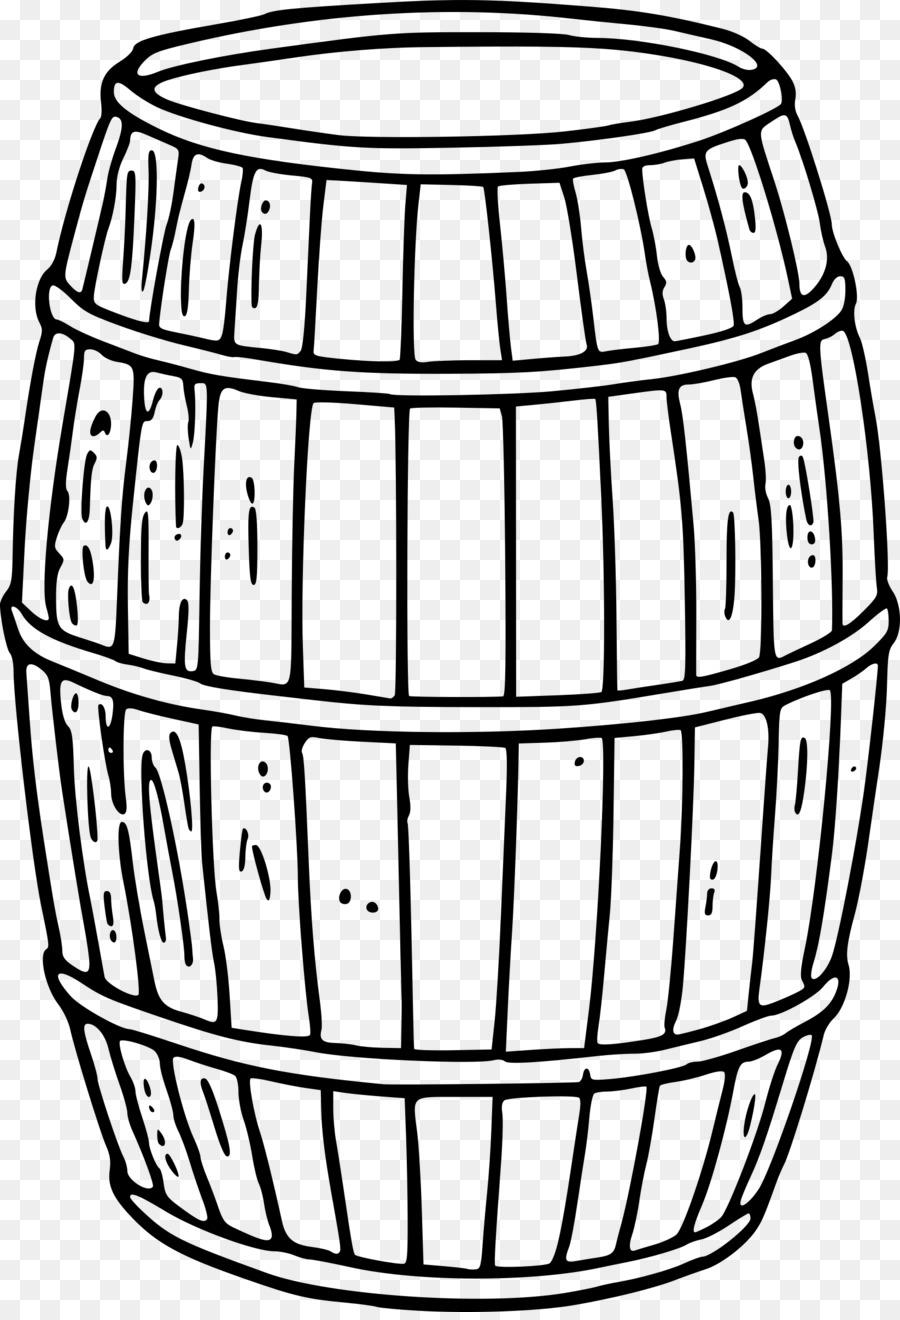 Barrel Line Art png download.